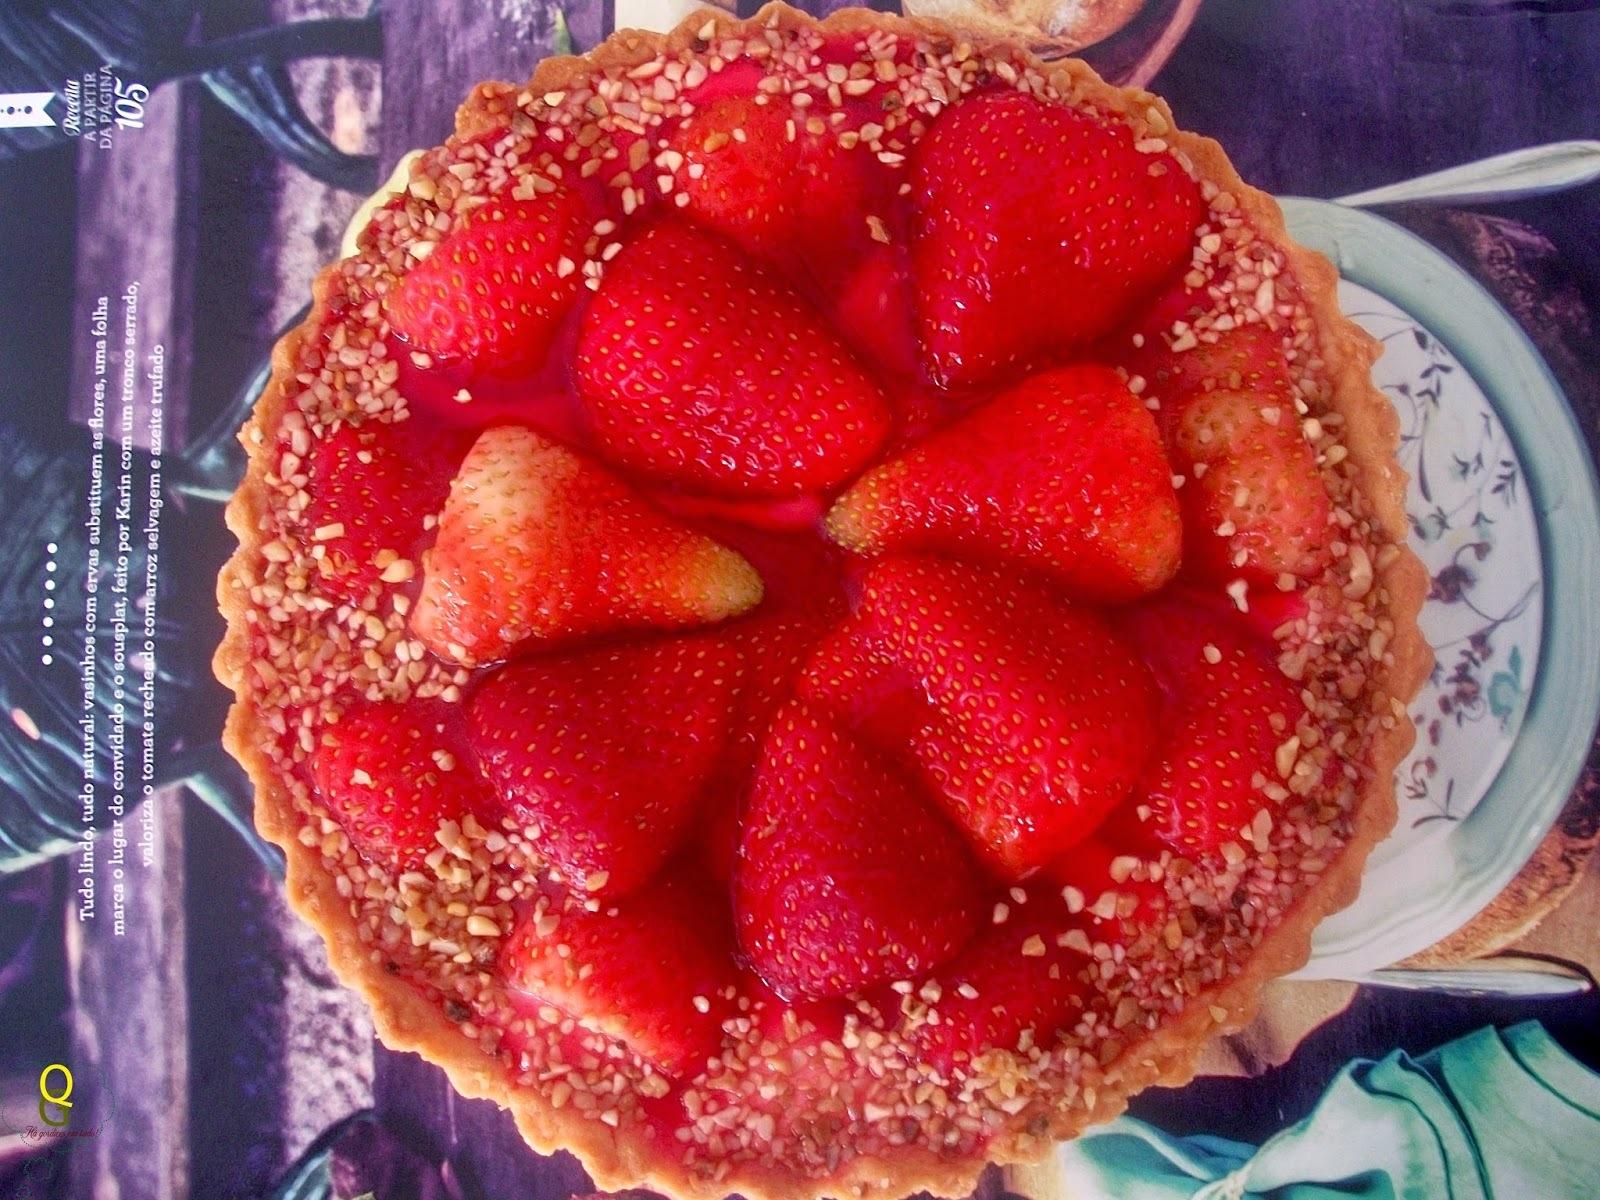 torta de morango pode ser congelada